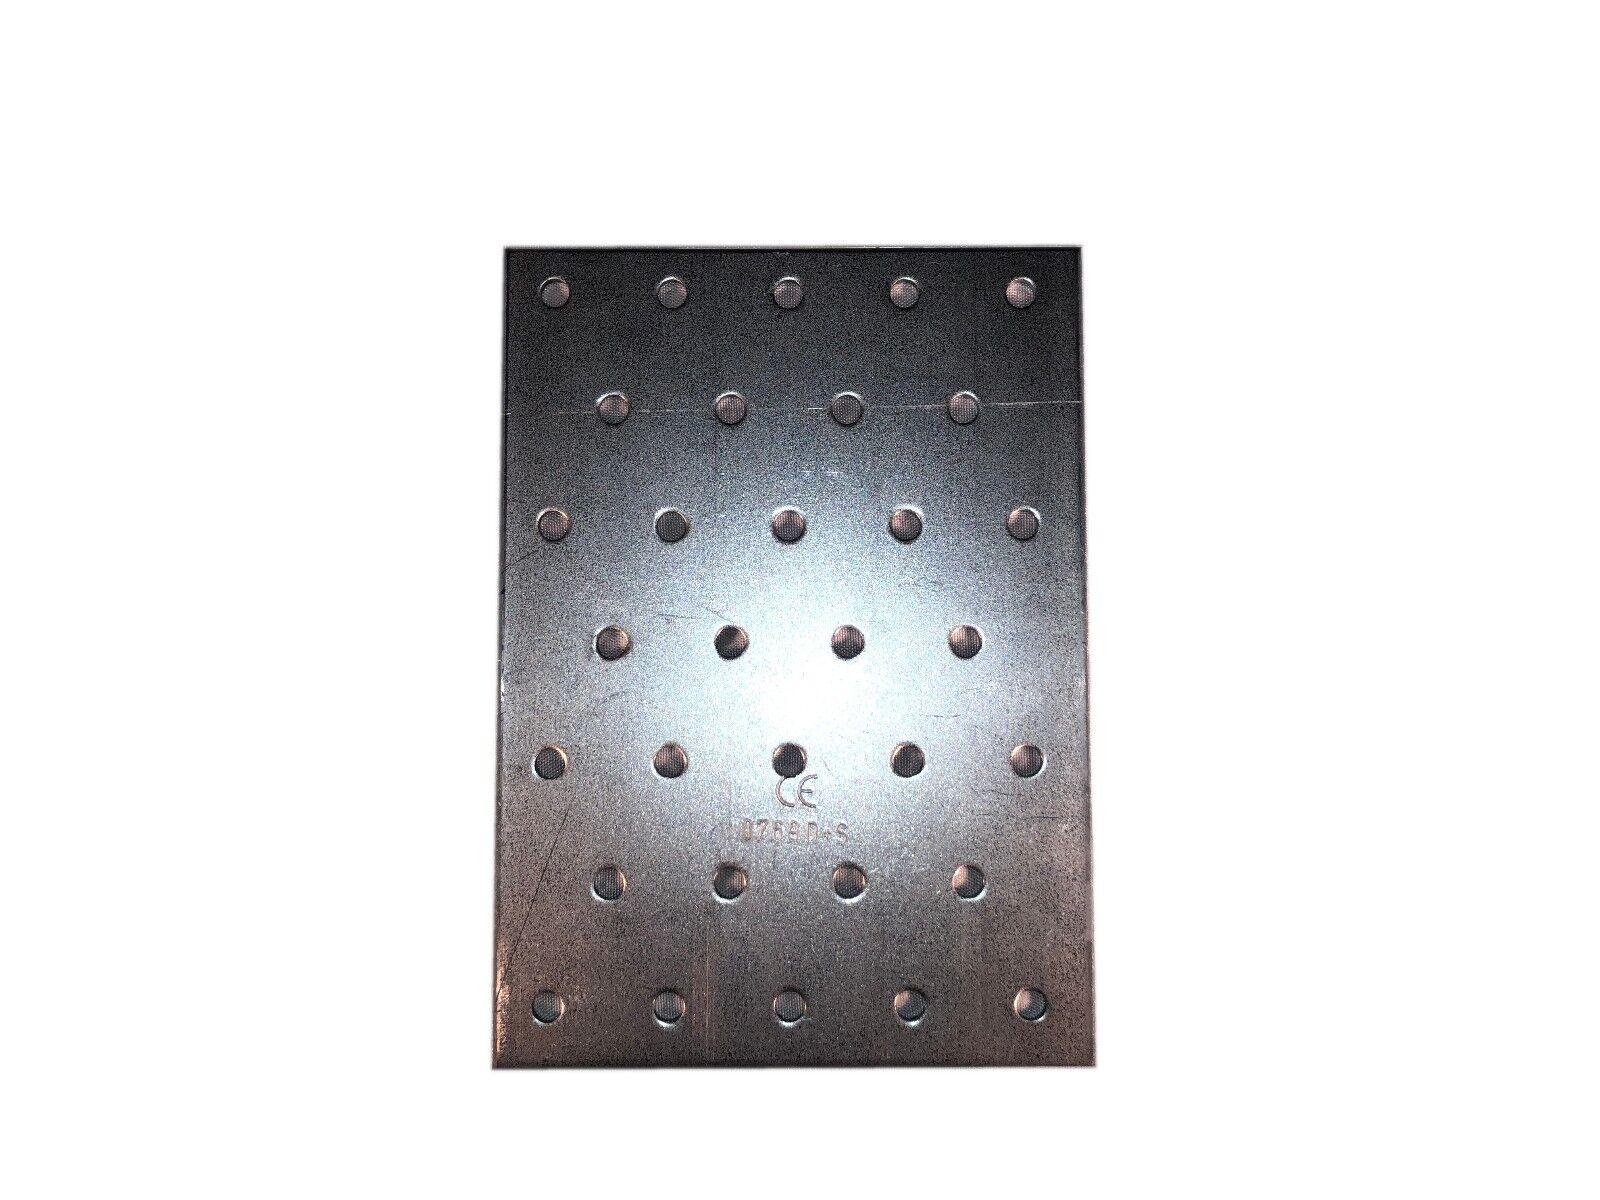 Lochplatten Holzverbinder Lochbleche Nagelplatten Flachverbinder  | Mittlere Kosten